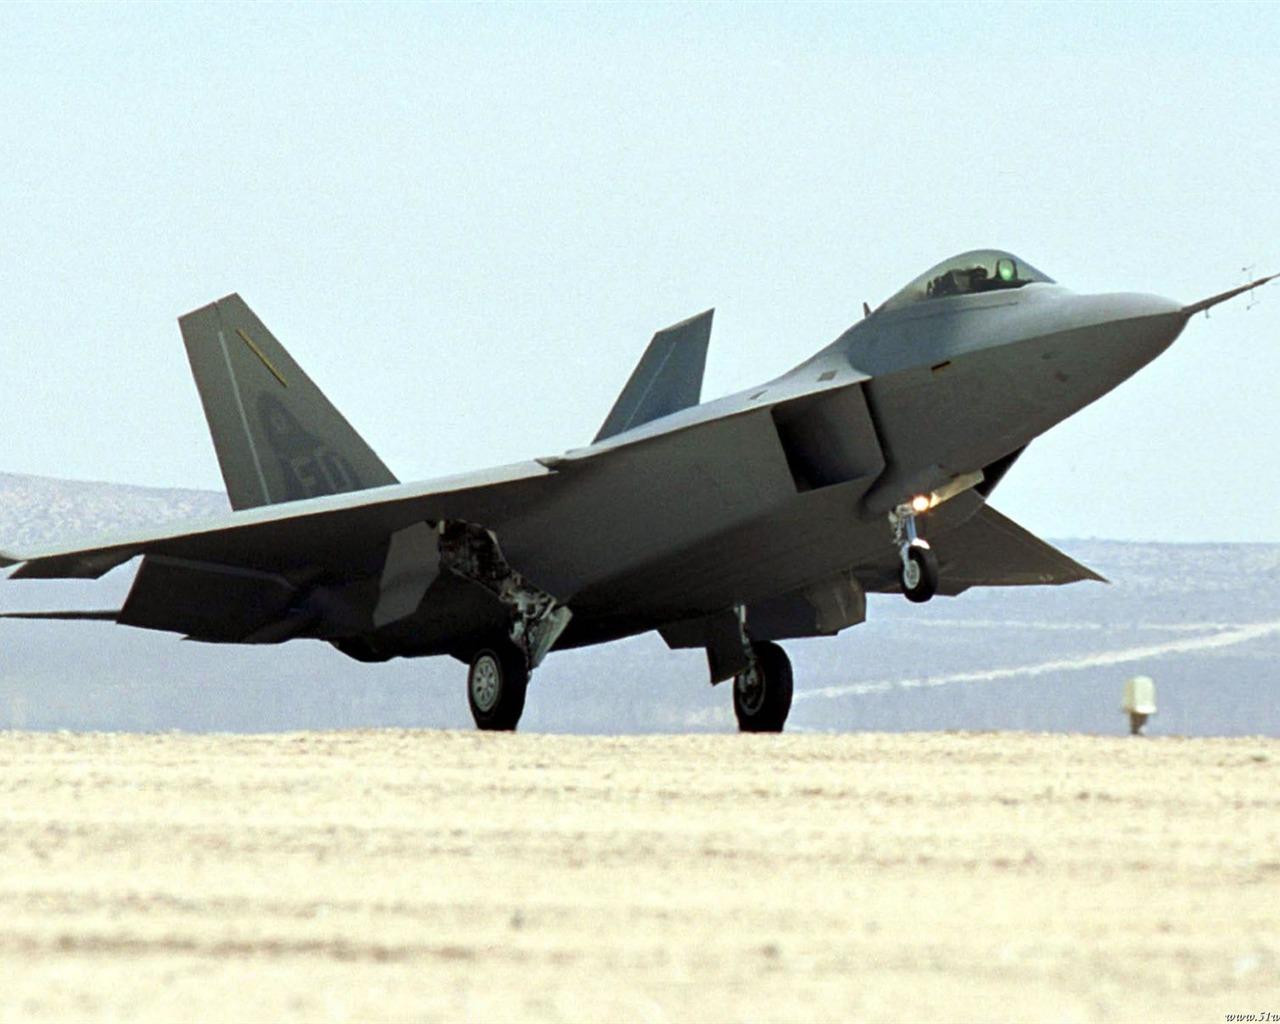 F 22 (戦闘機)の画像 p1_33